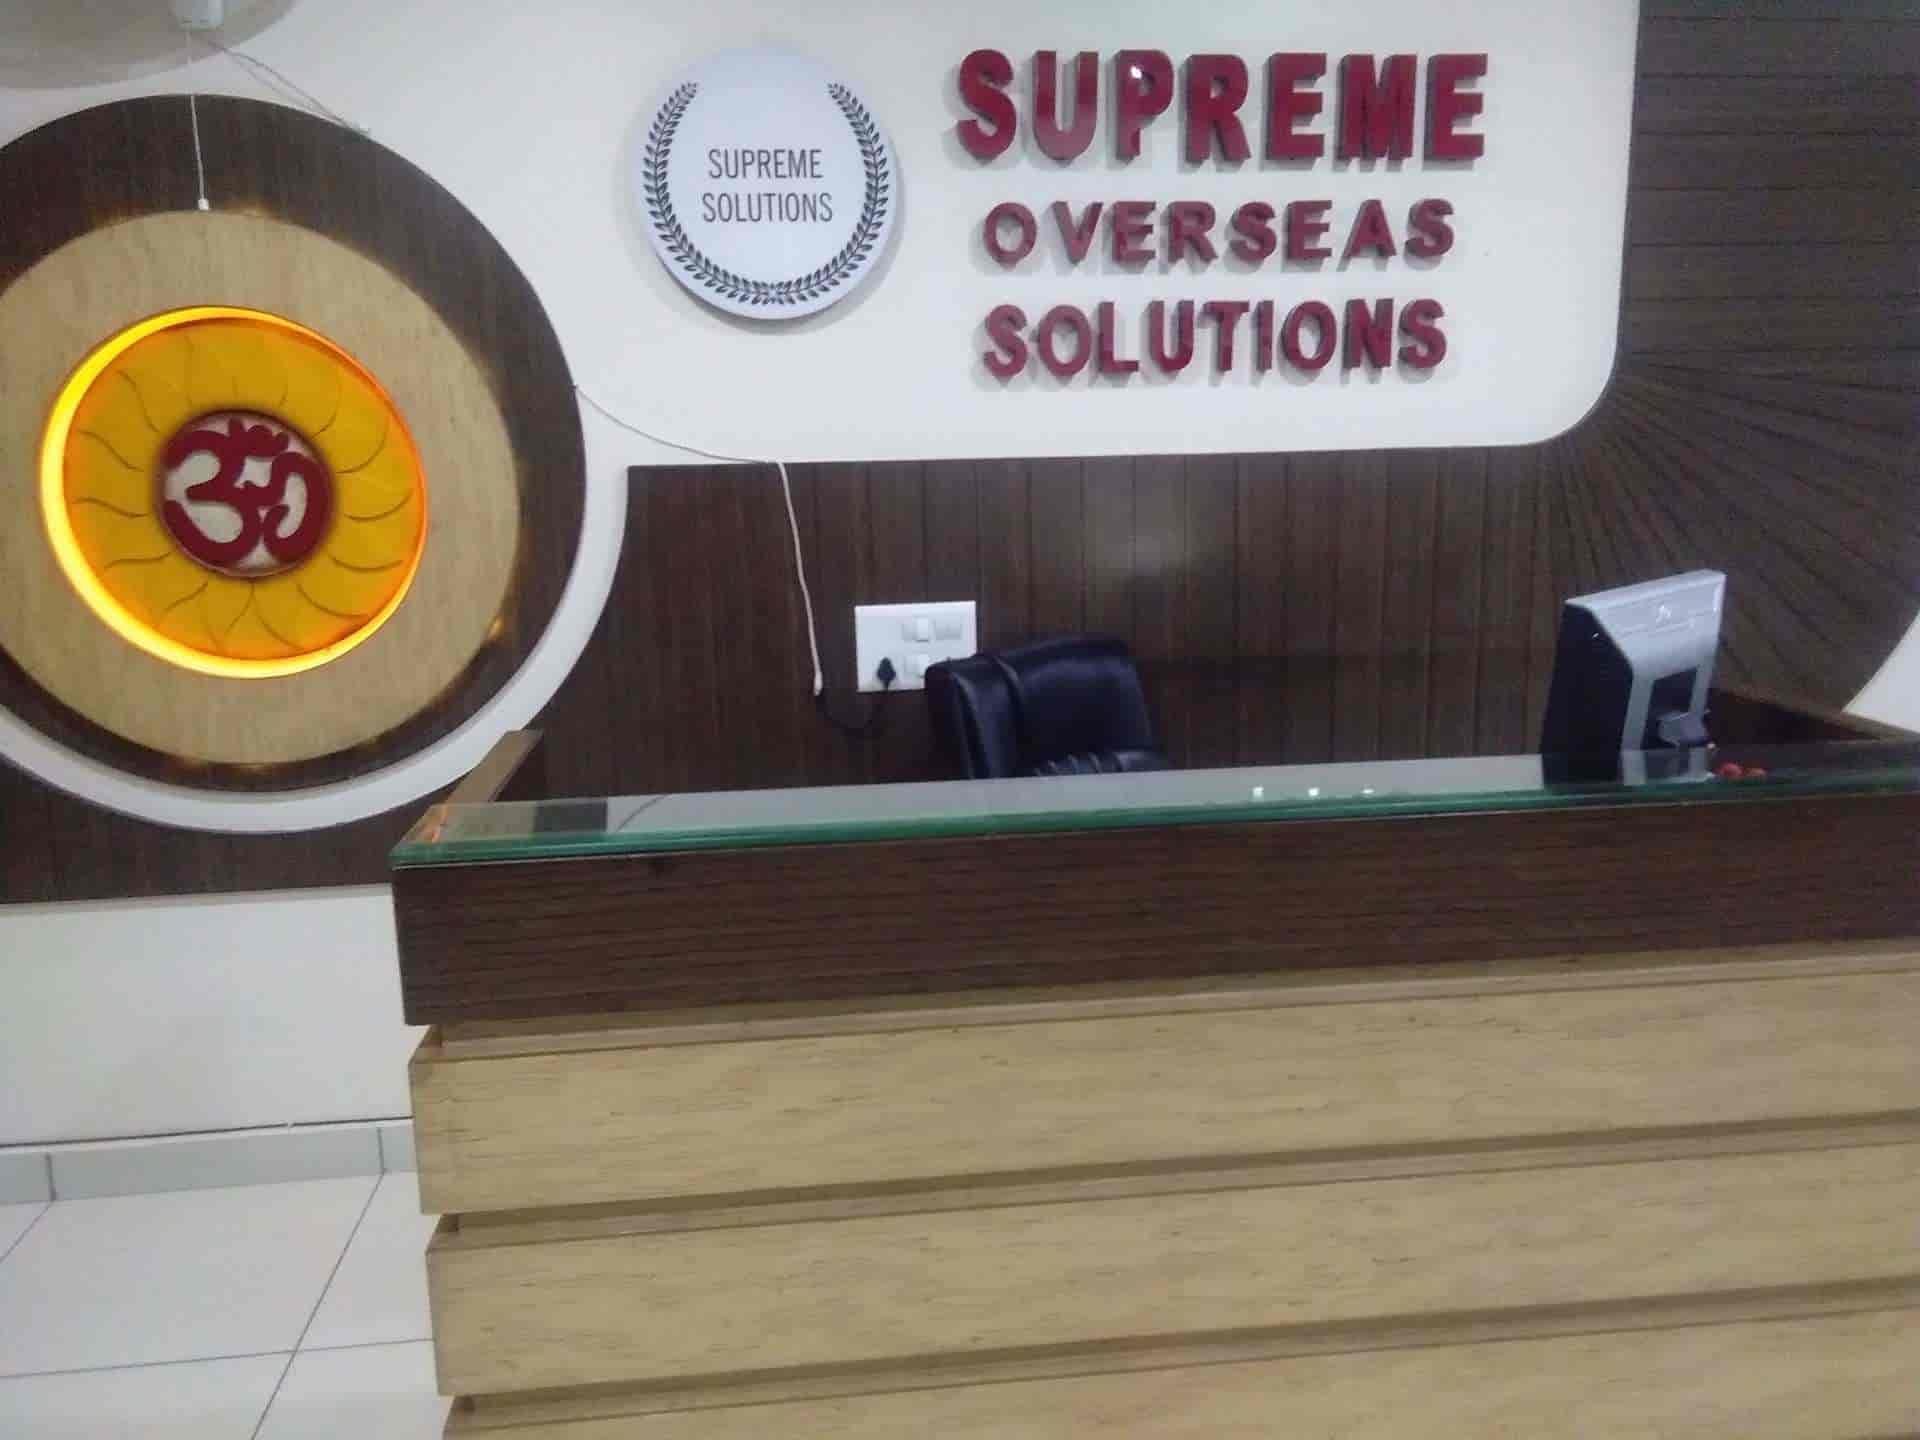 svorio netekimo centrai Jalandhare)